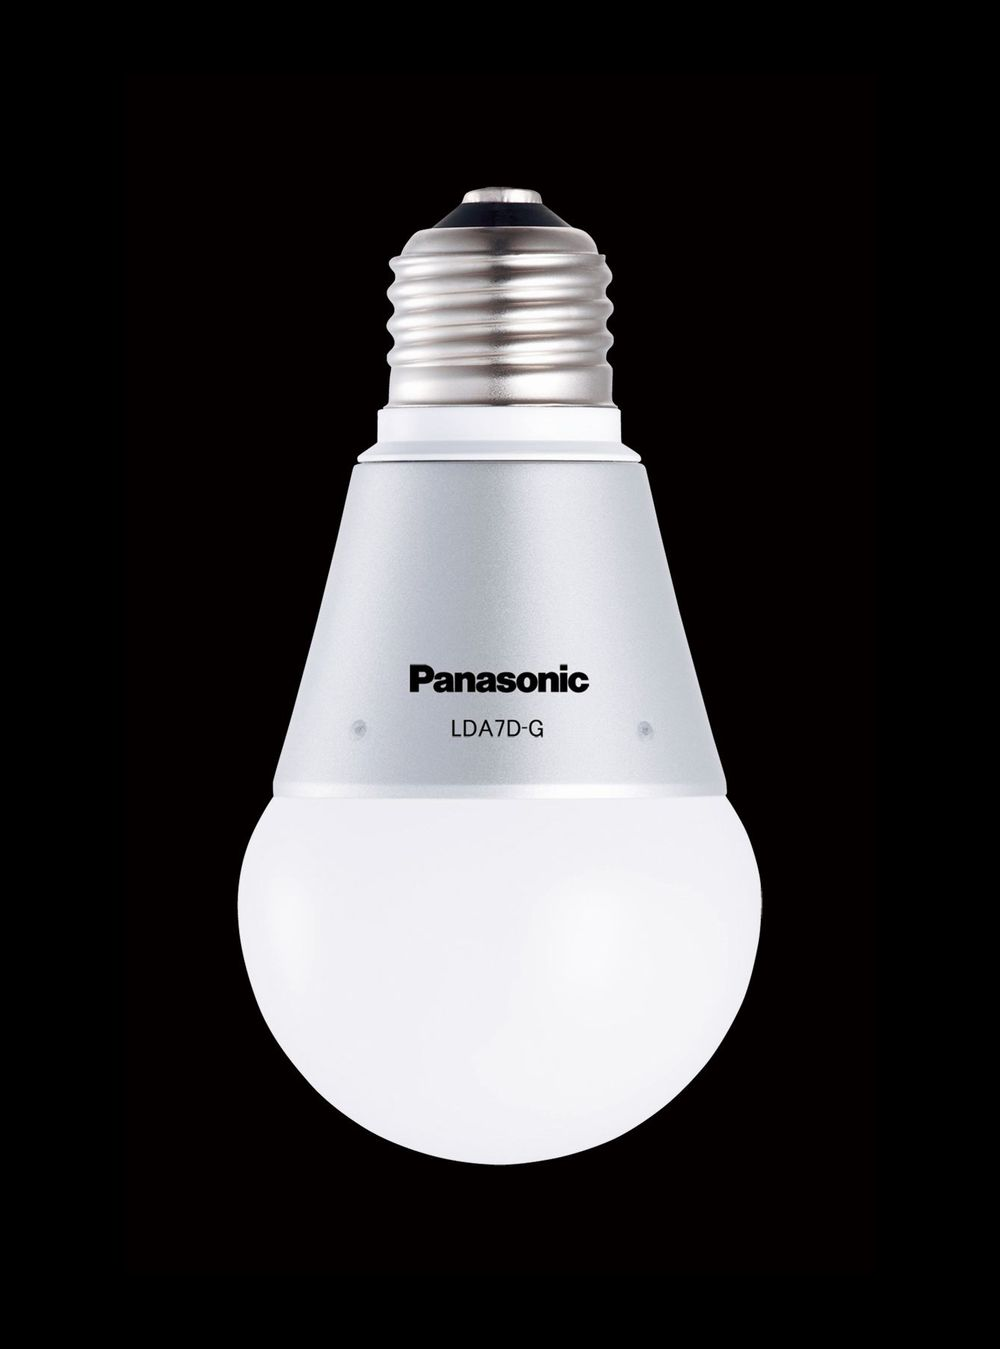 02_011126LED.jpg & Panasonic EVERLEDS LED Bulbs with Wide Light Distribution Angle ... azcodes.com